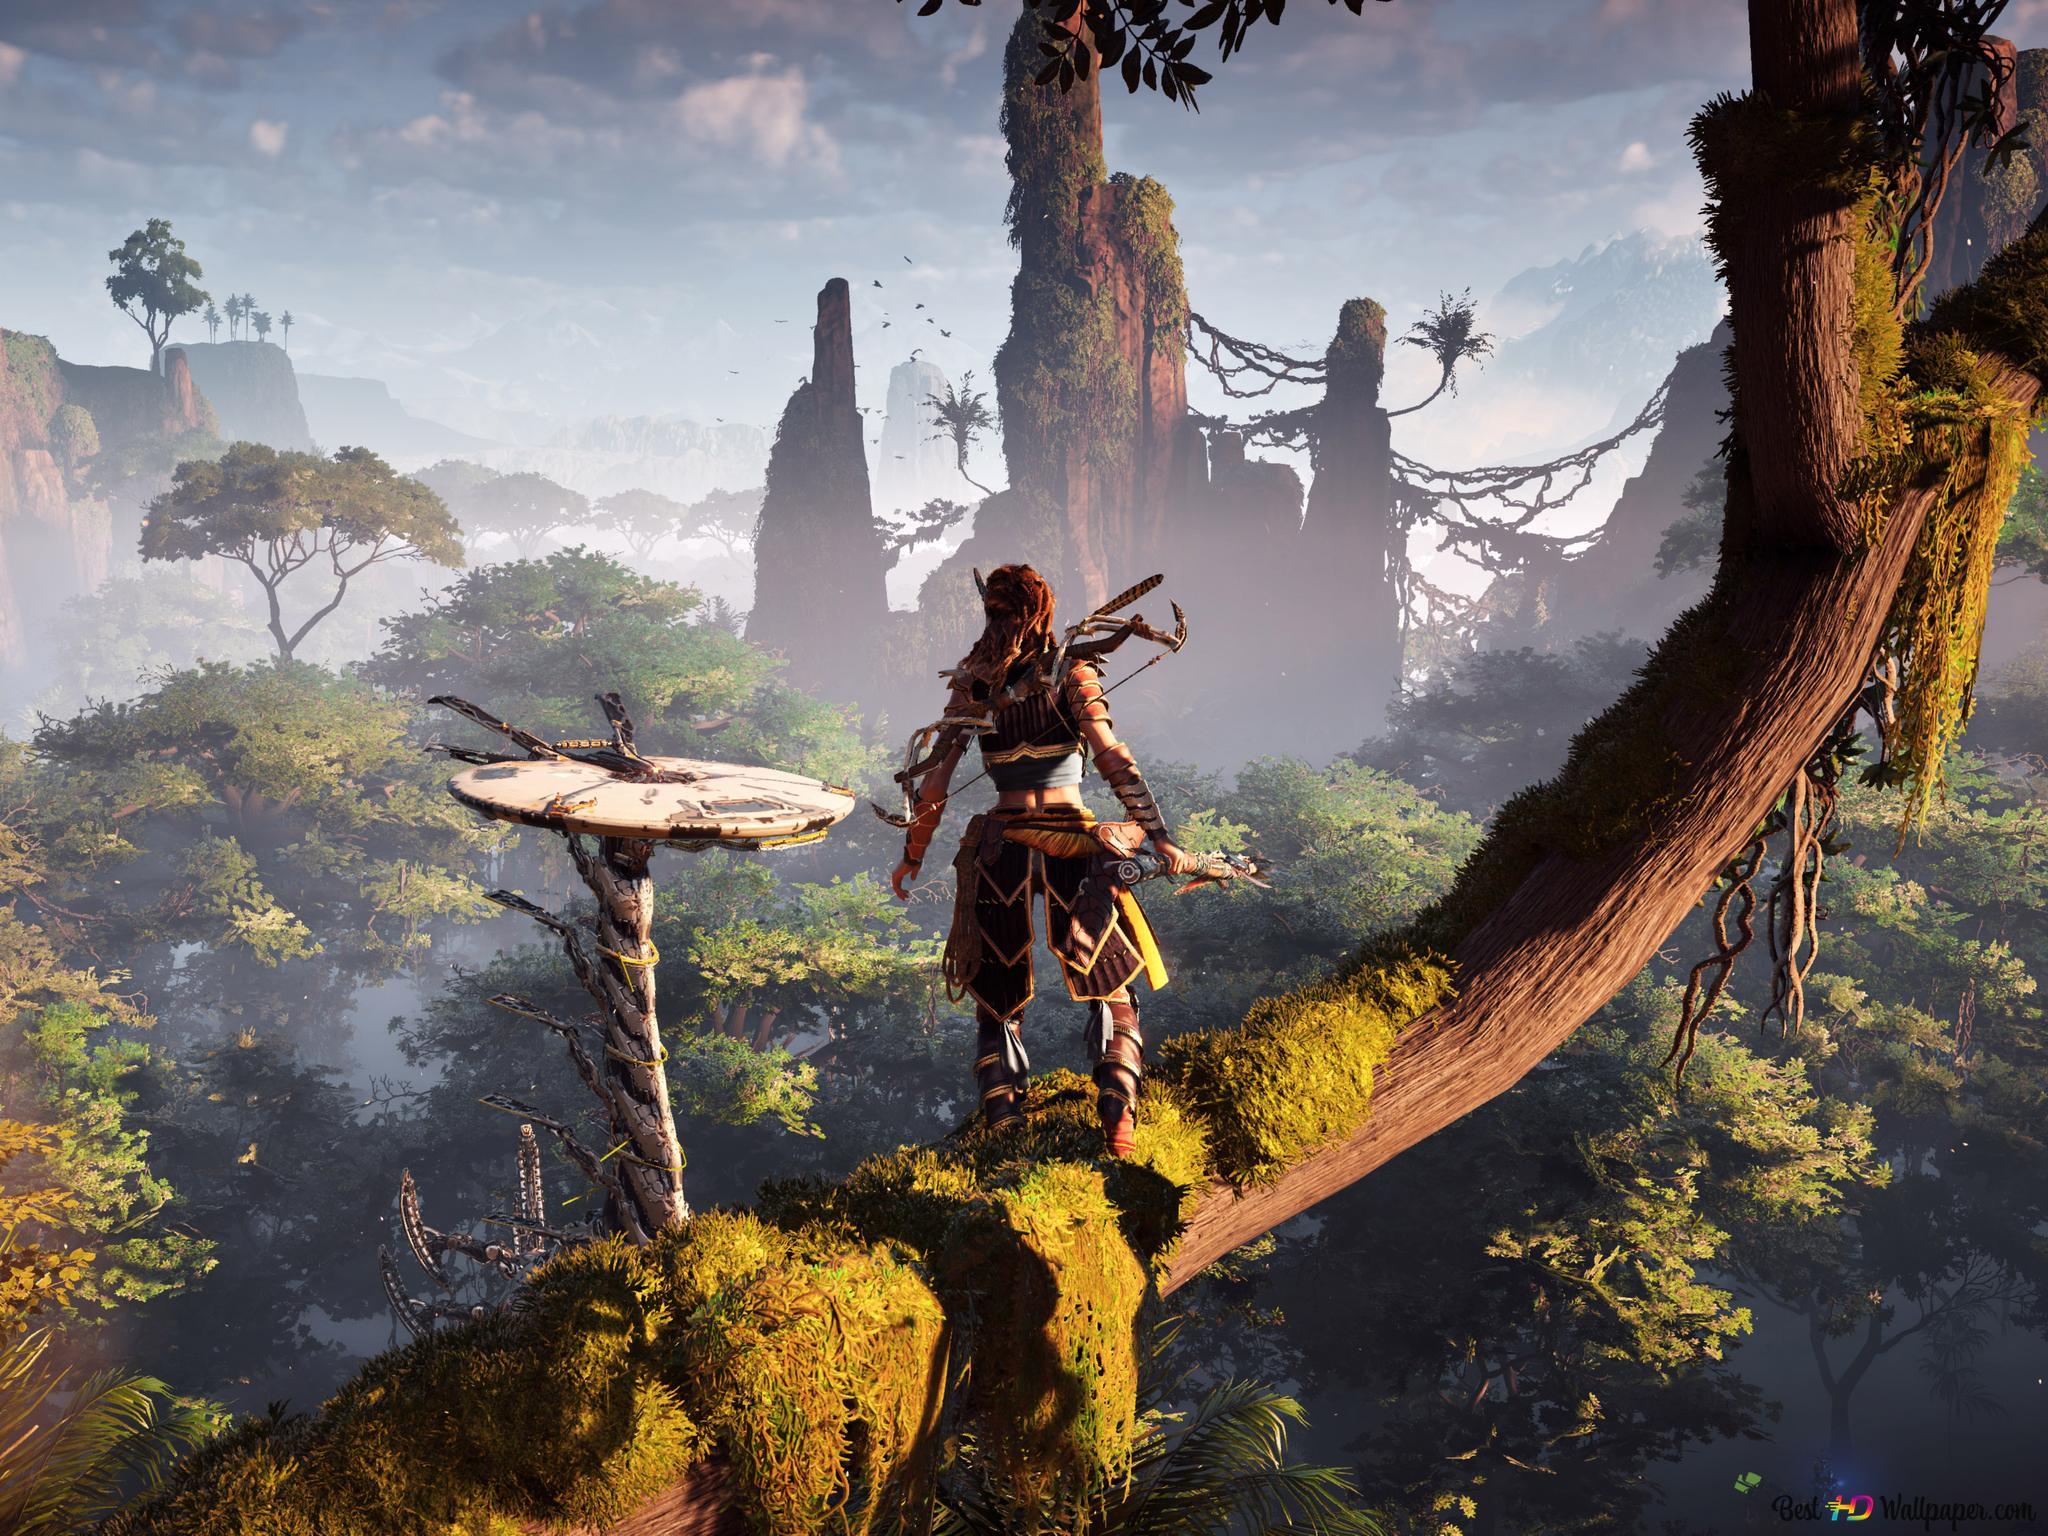 Horizon Zero Dawn Aloy In The Forest Gameplay Hd Wallpaper